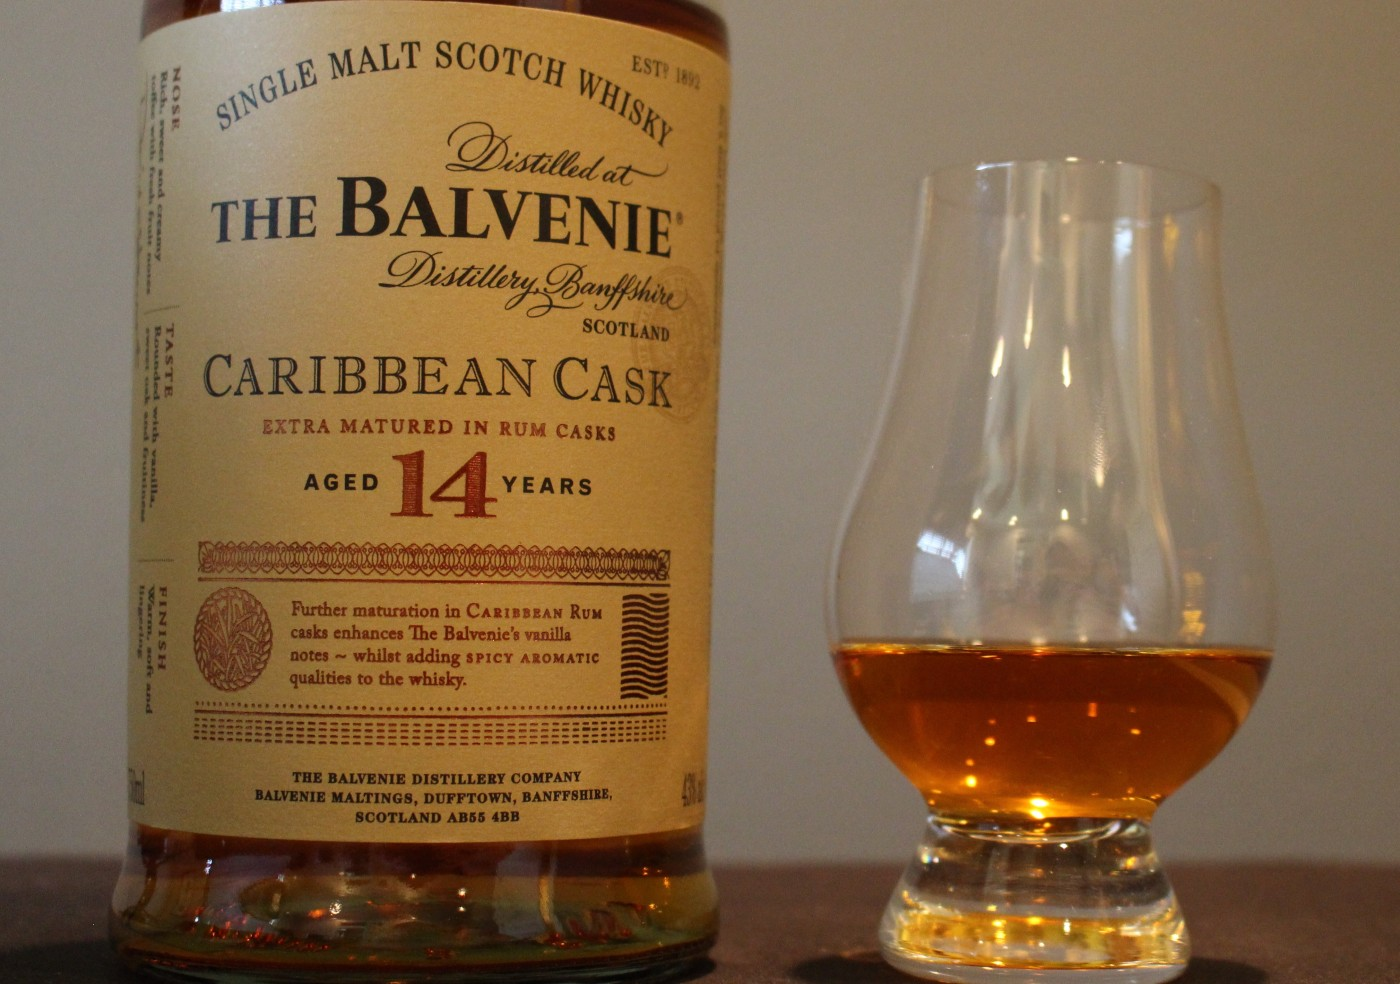 Balevenie_CaribbeanCask_01